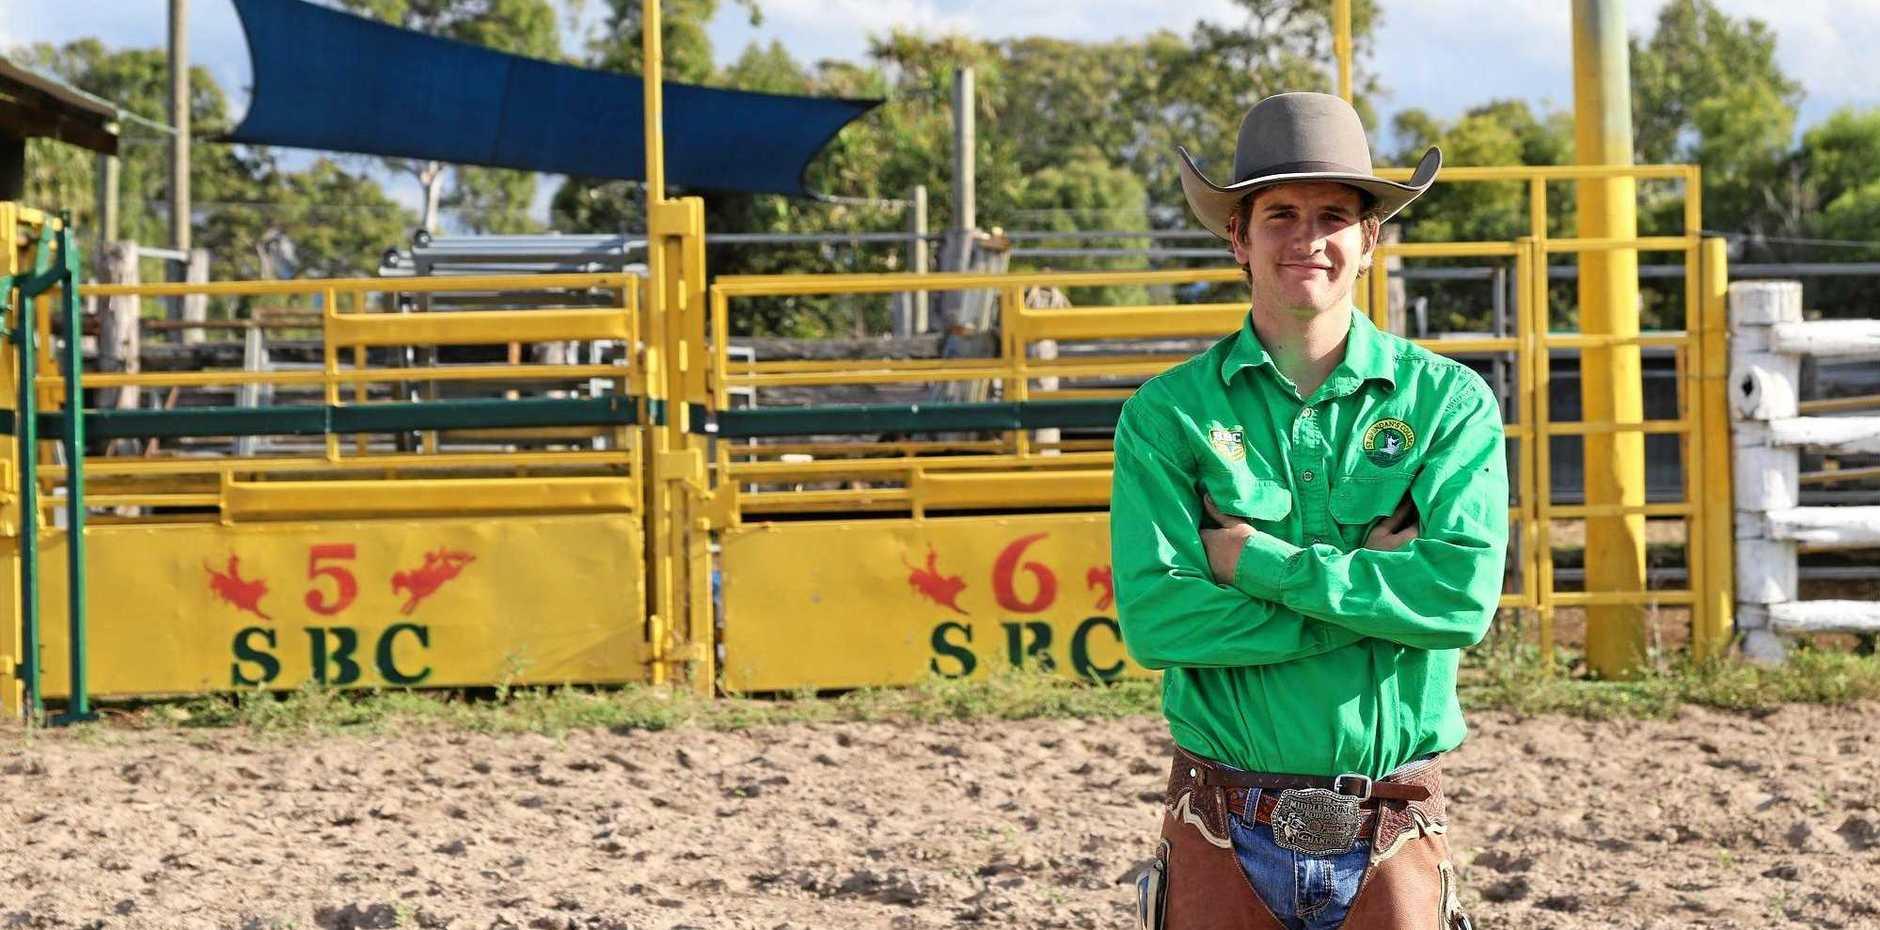 ON THE ROAD(EO): 2019 St Brendan's College Rodeo Captain Logan Beak.